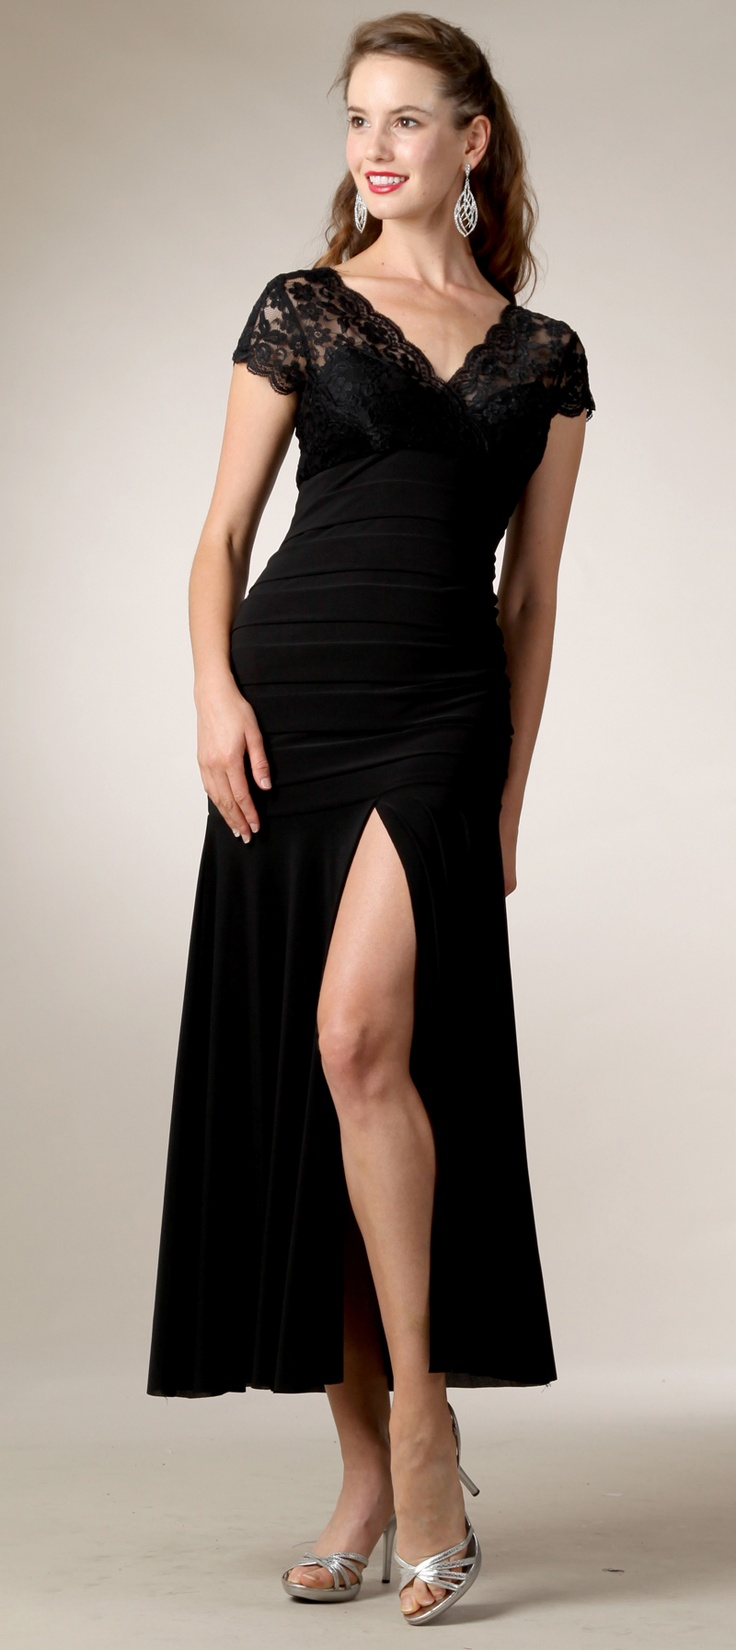 112 best formal gowns and dresses images on pinterest formal black lace top v neckline short sleeve with front slit long formal dress 5 formal maternity dressessemi ombrellifo Images